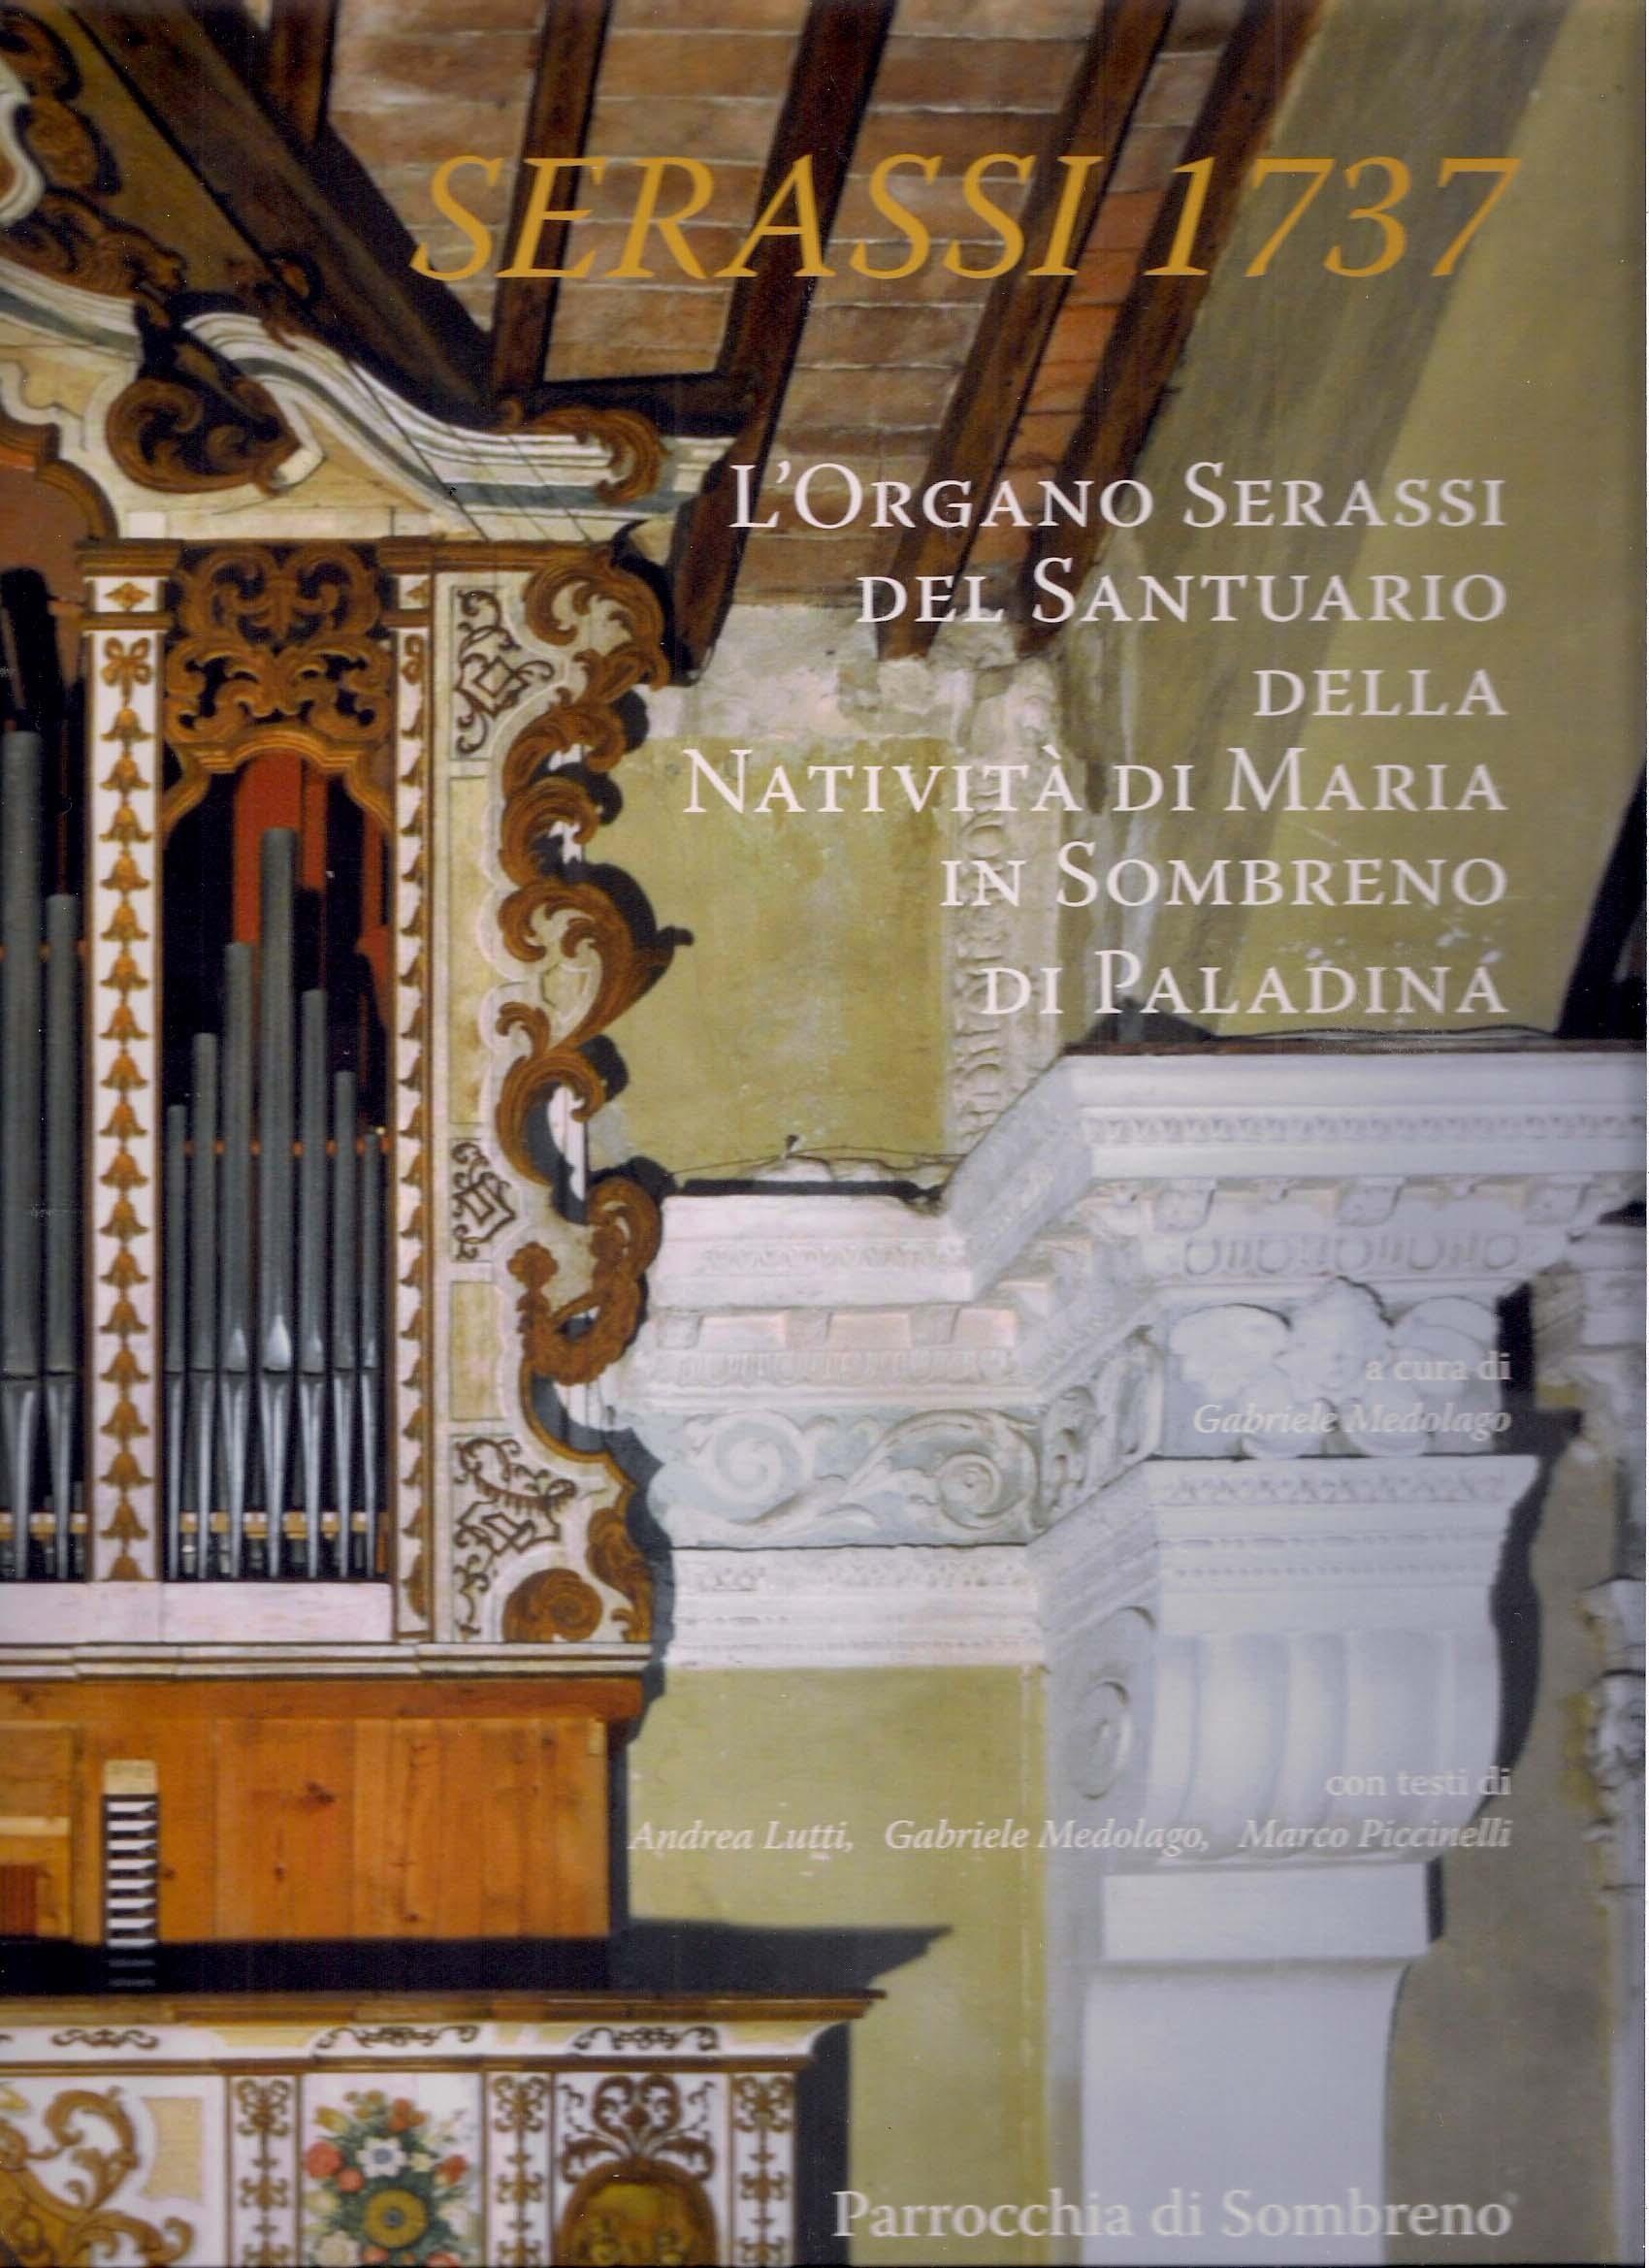 serassi-1737